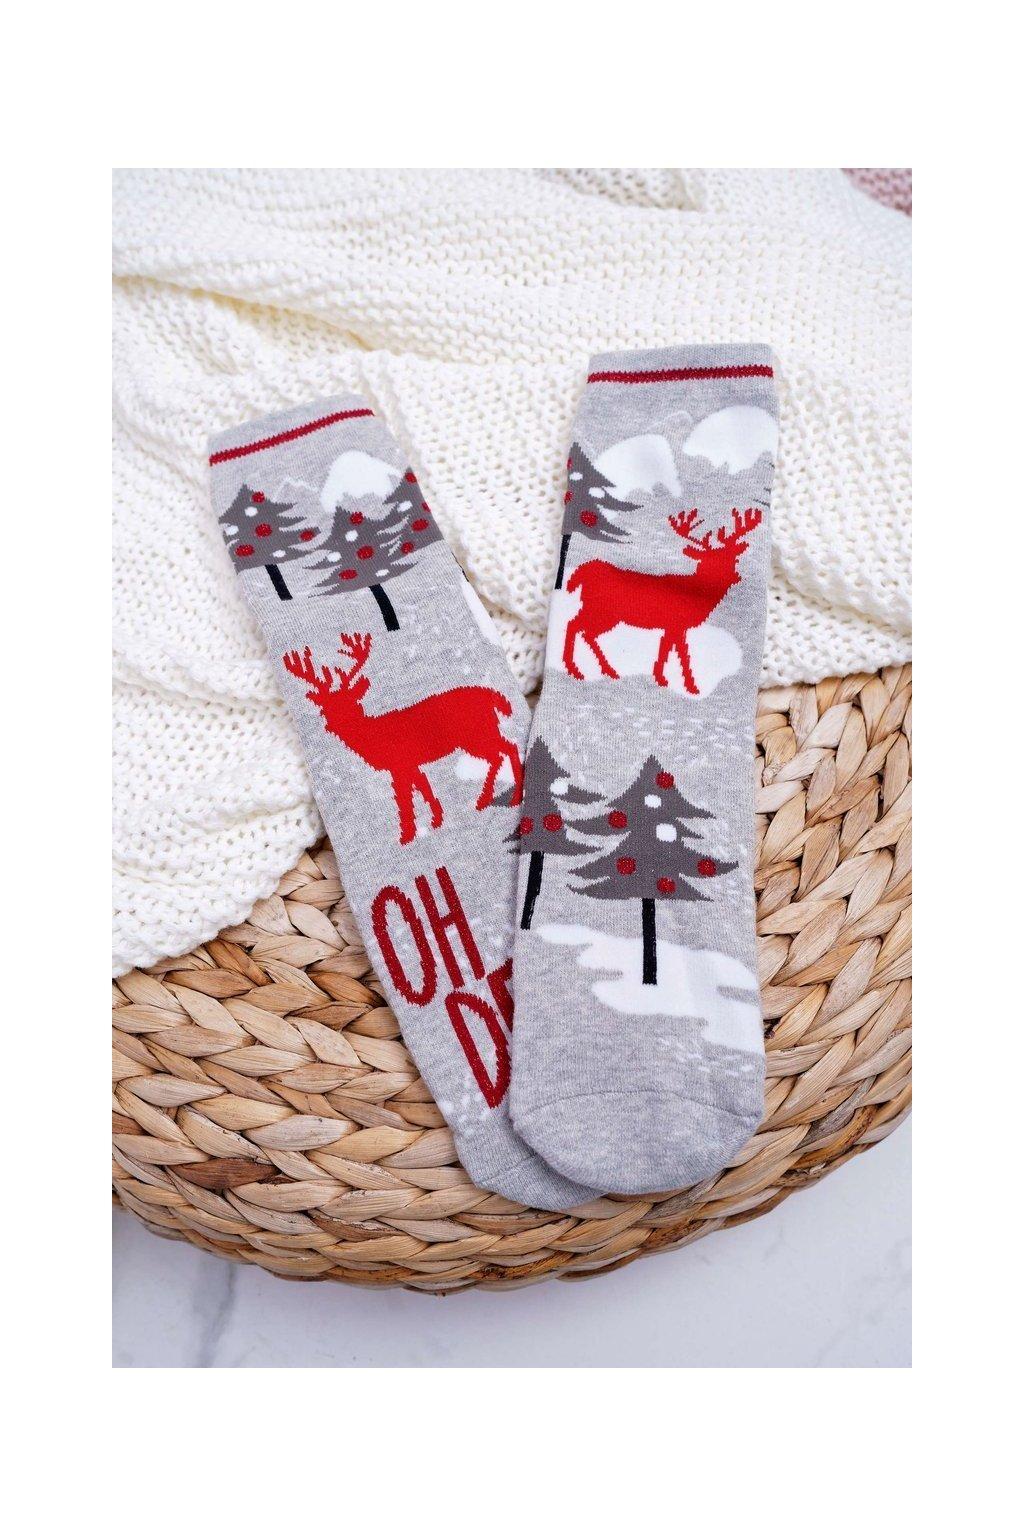 Dámske Ponožky vianočné protiskluzové sivé OH DEER